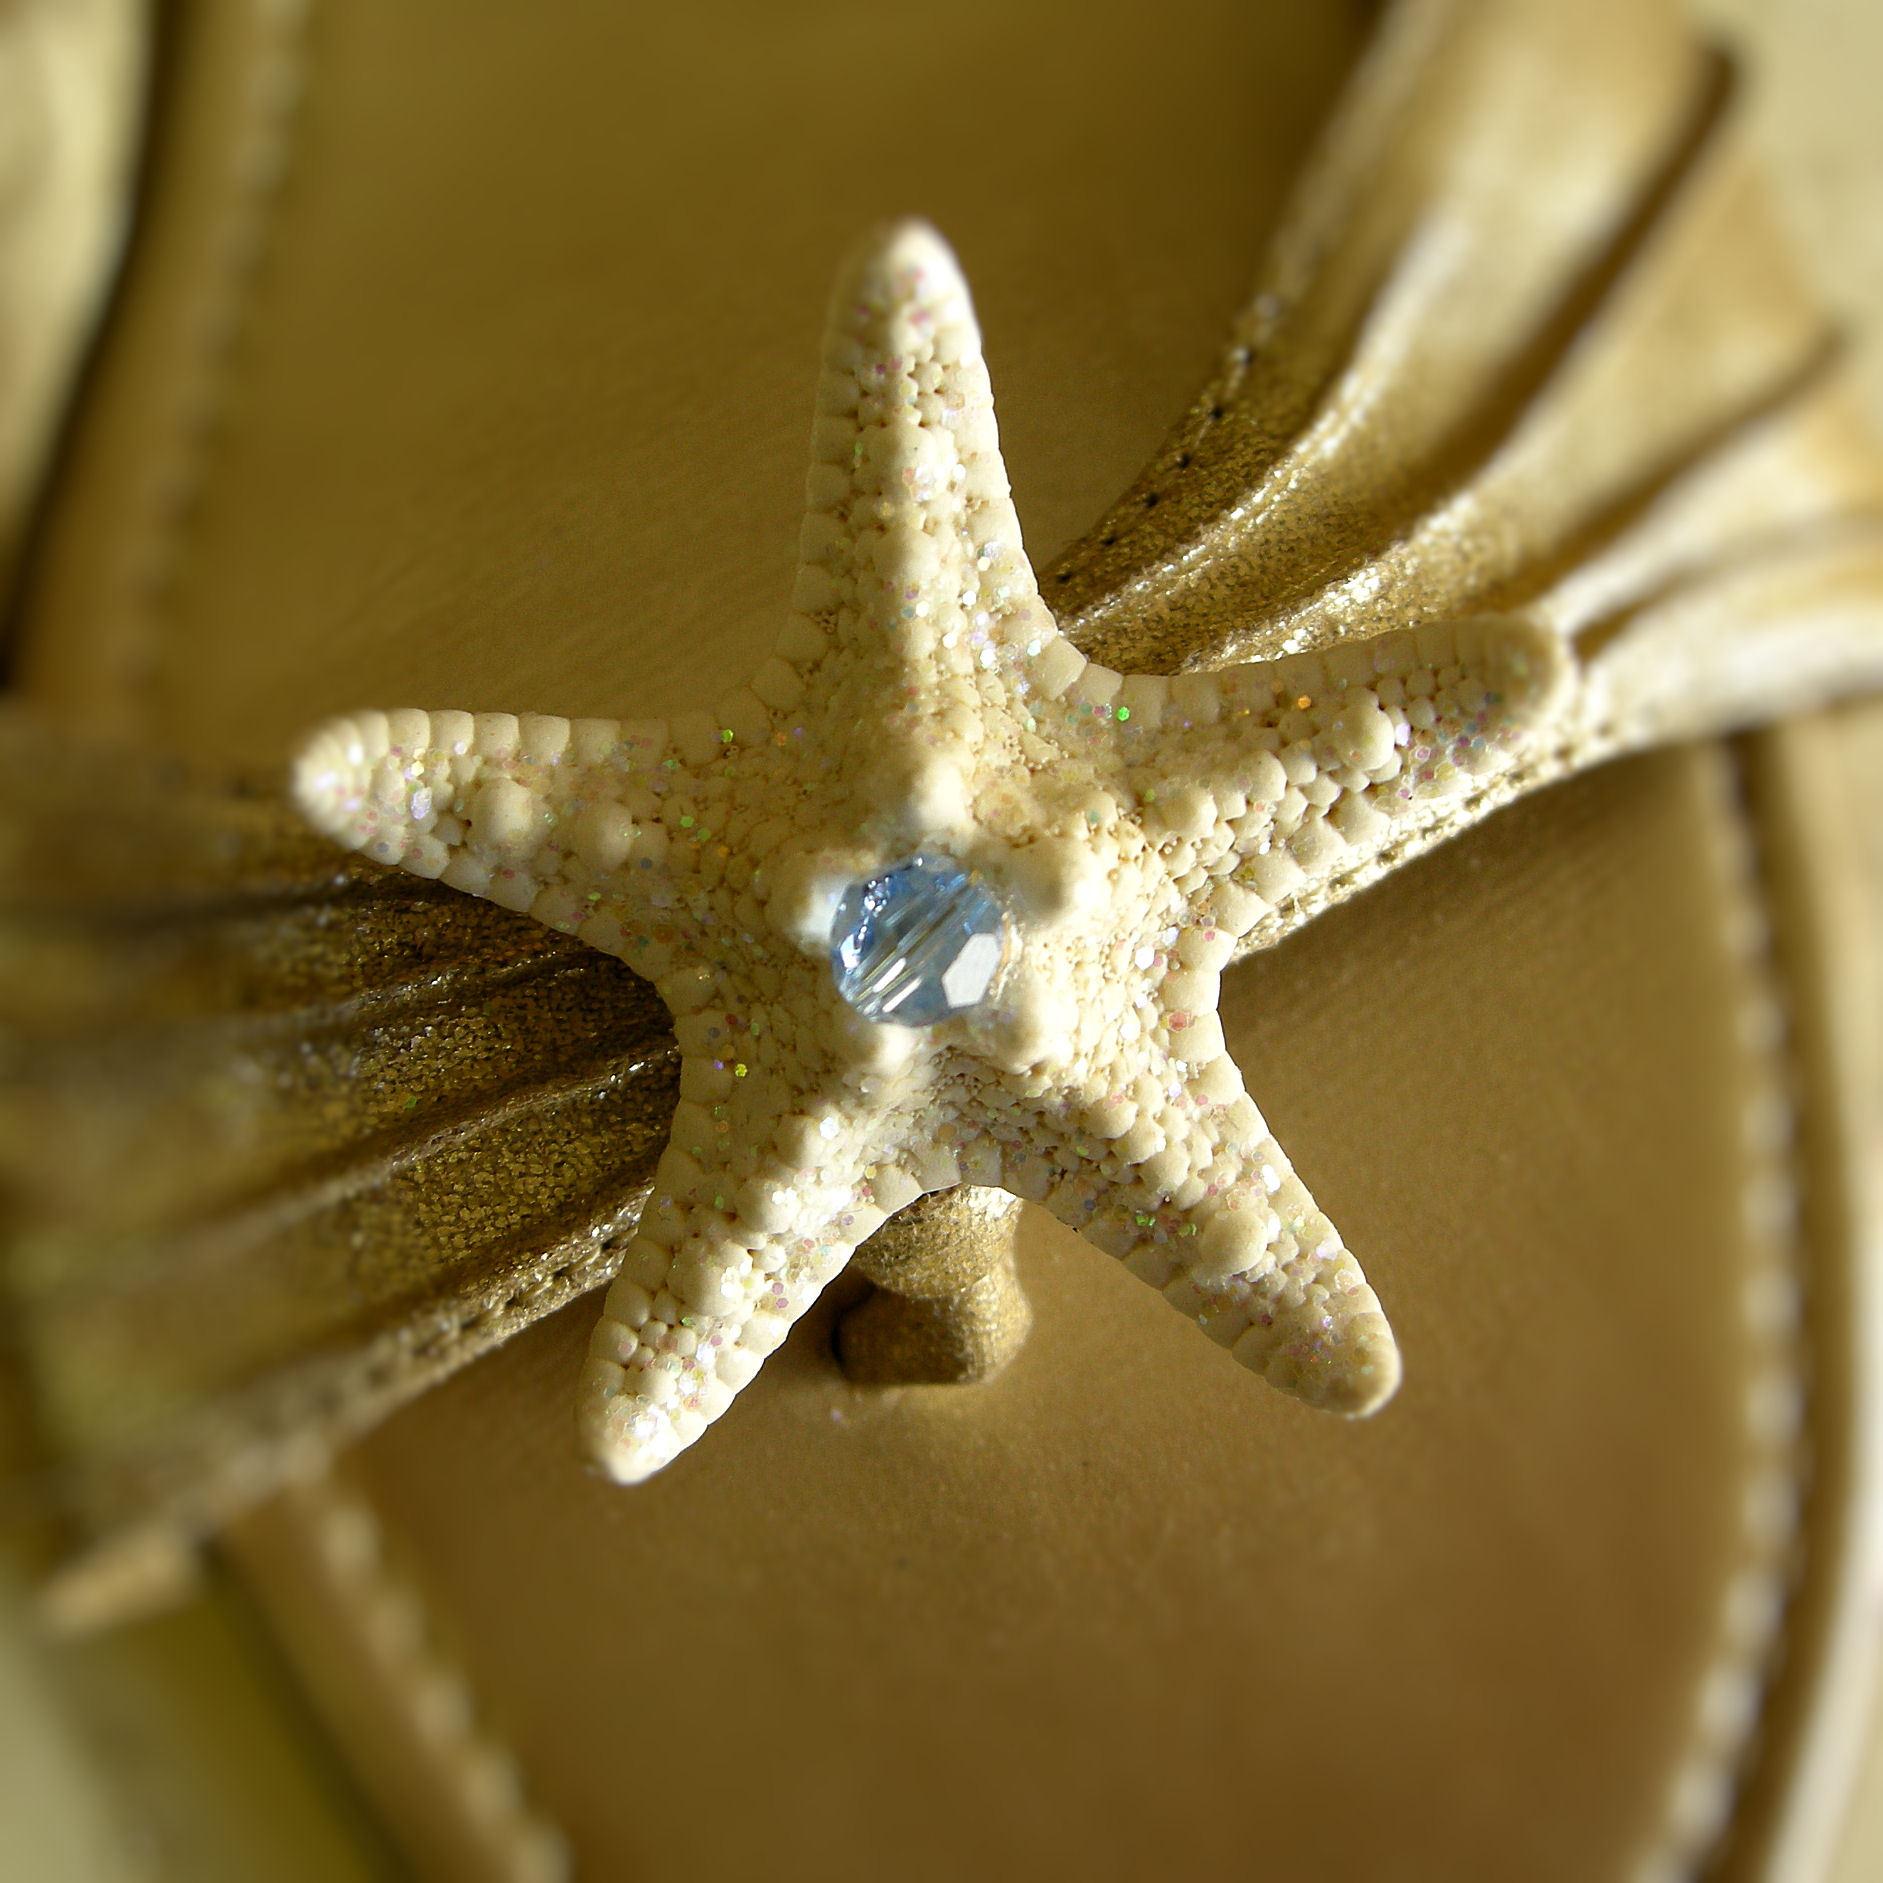 Wedding Dresses, Shoes, Fashion, blue, dress, Shoe, Something, Clips, Shellscapes